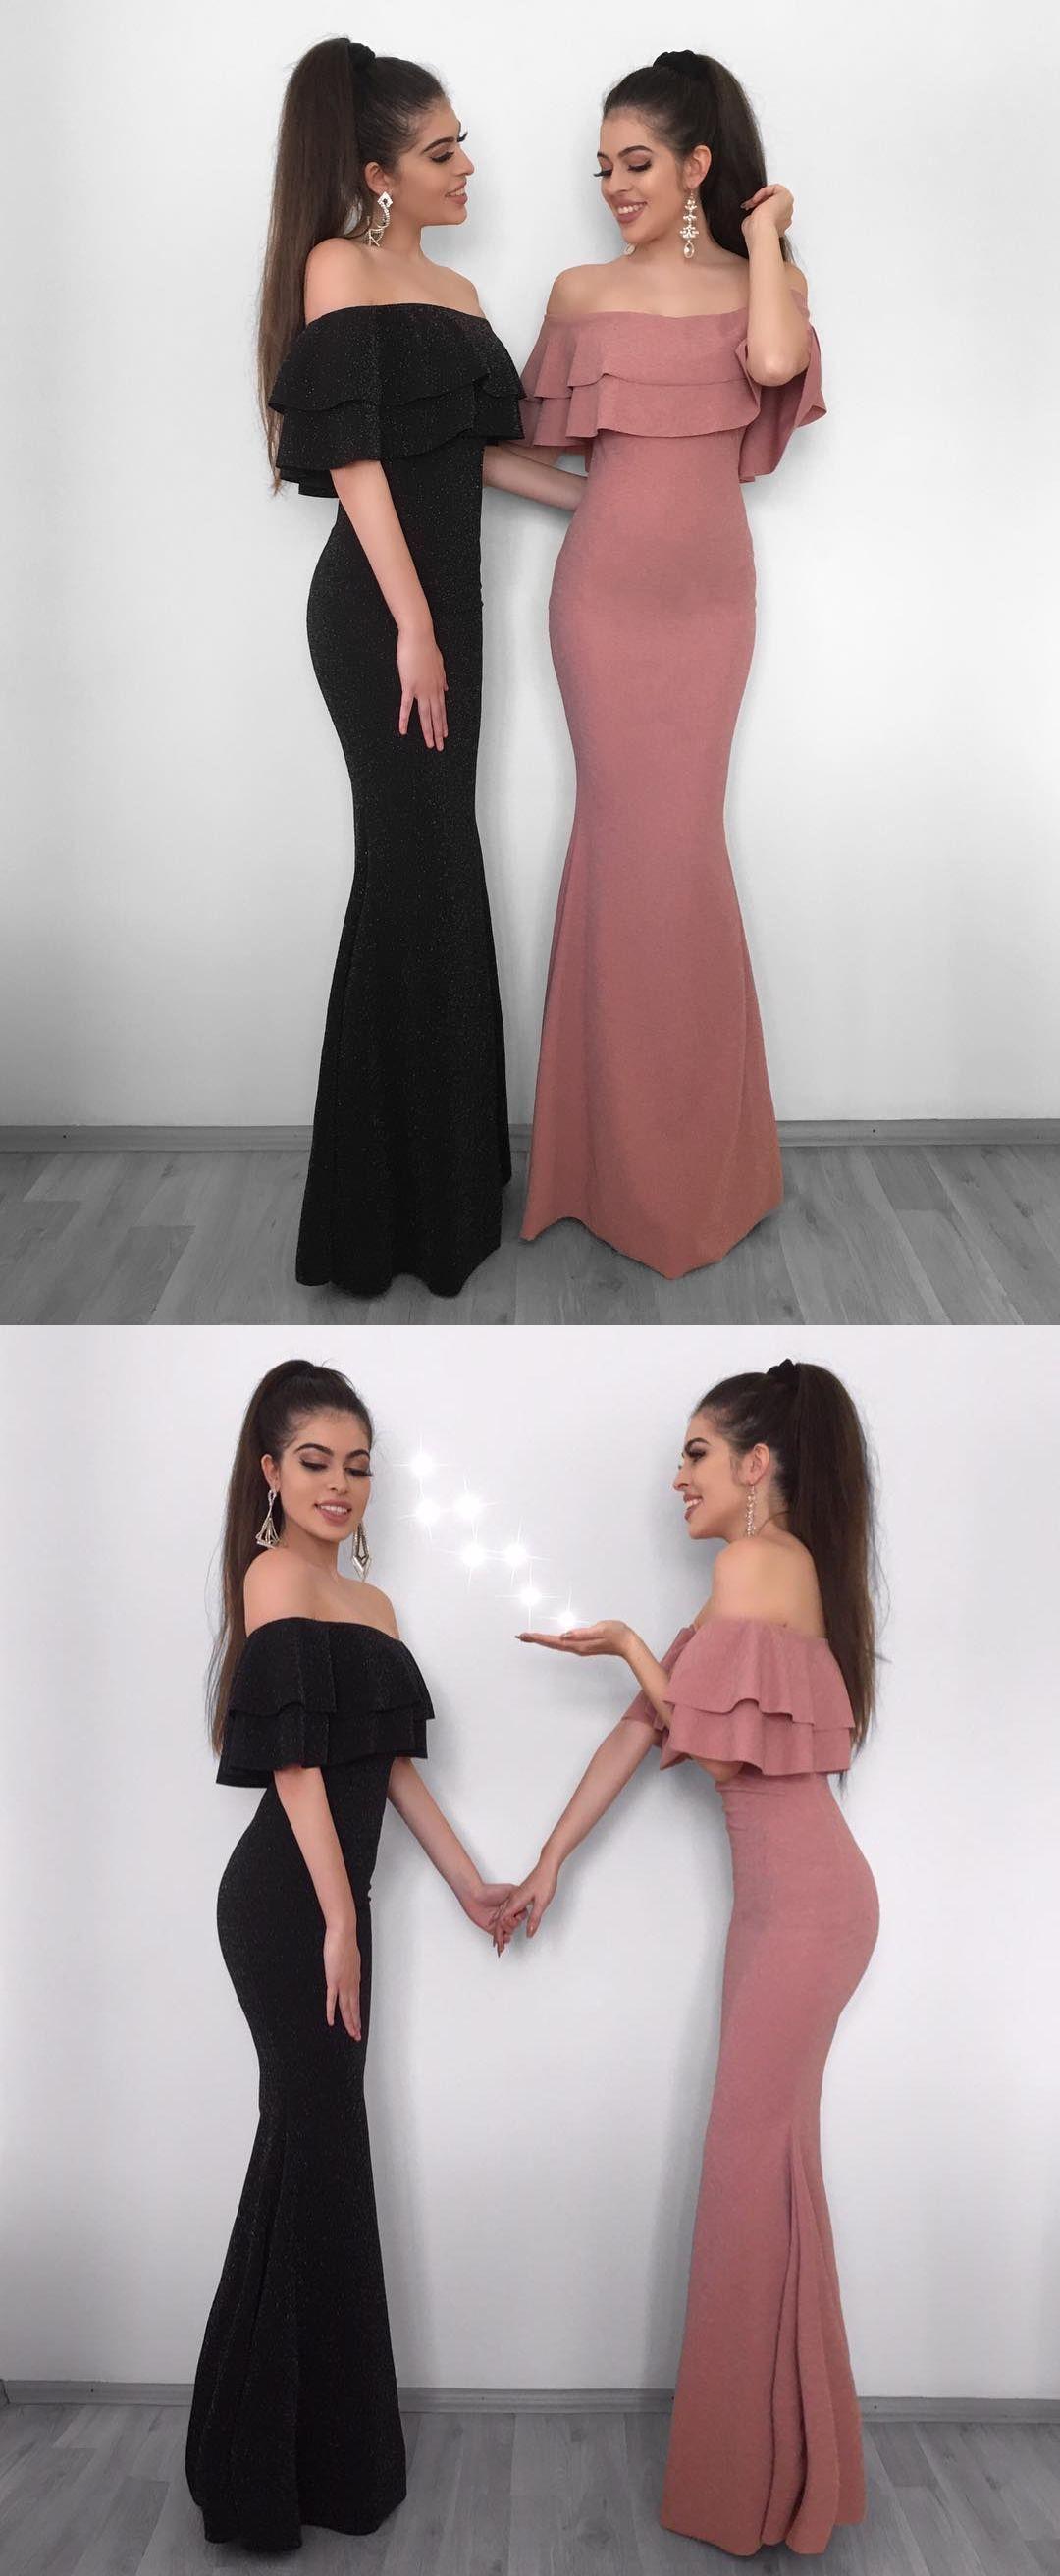 Womens dresses pinposhcom clothing dressesoutfit pinterest